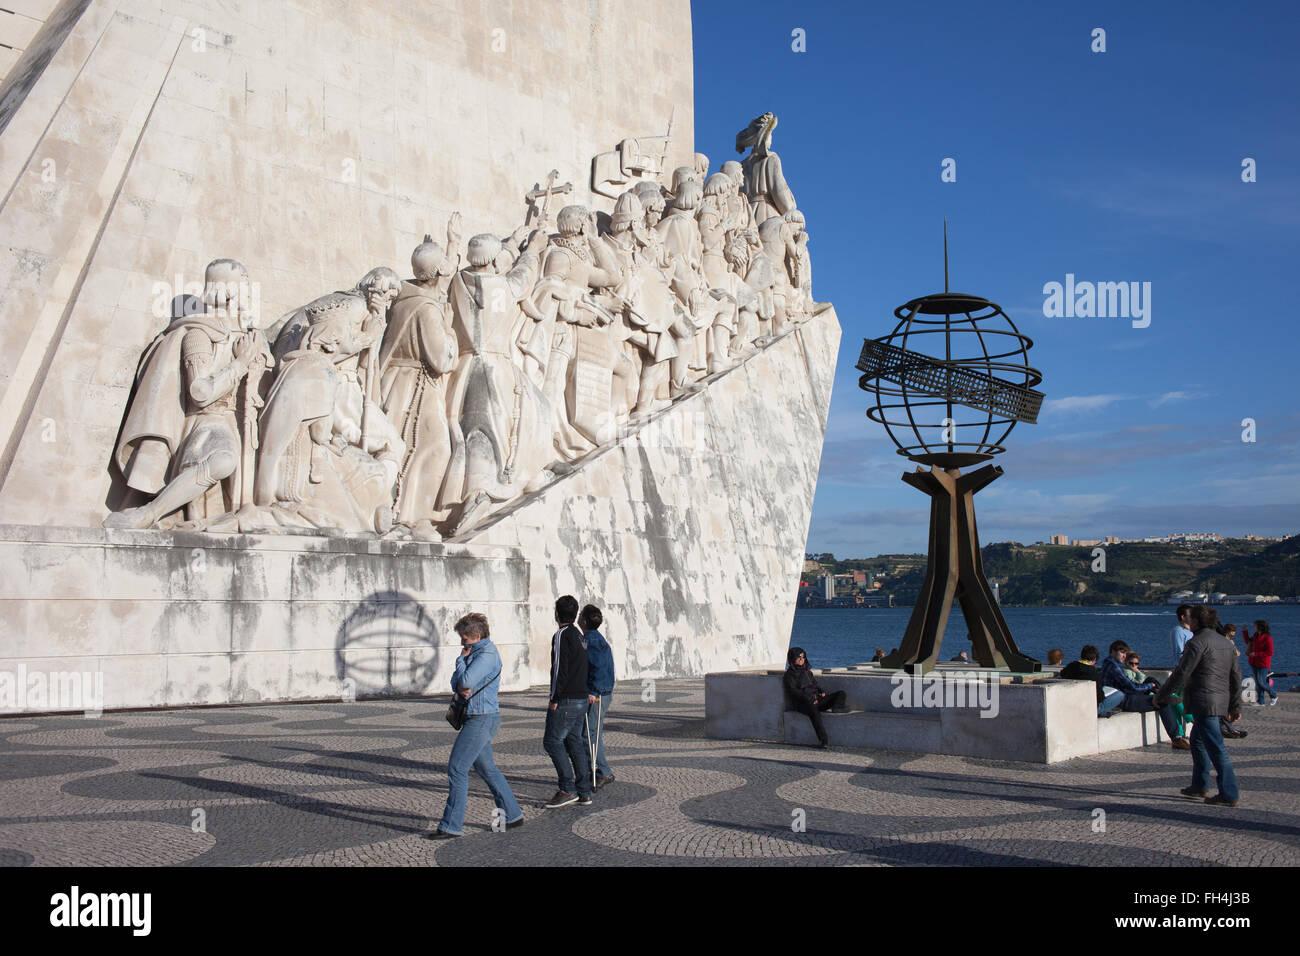 Portugal, Lisbon, Belem, Monument to the Discoveries (Padrao dos Descobrimentos), city landmark - Stock Image